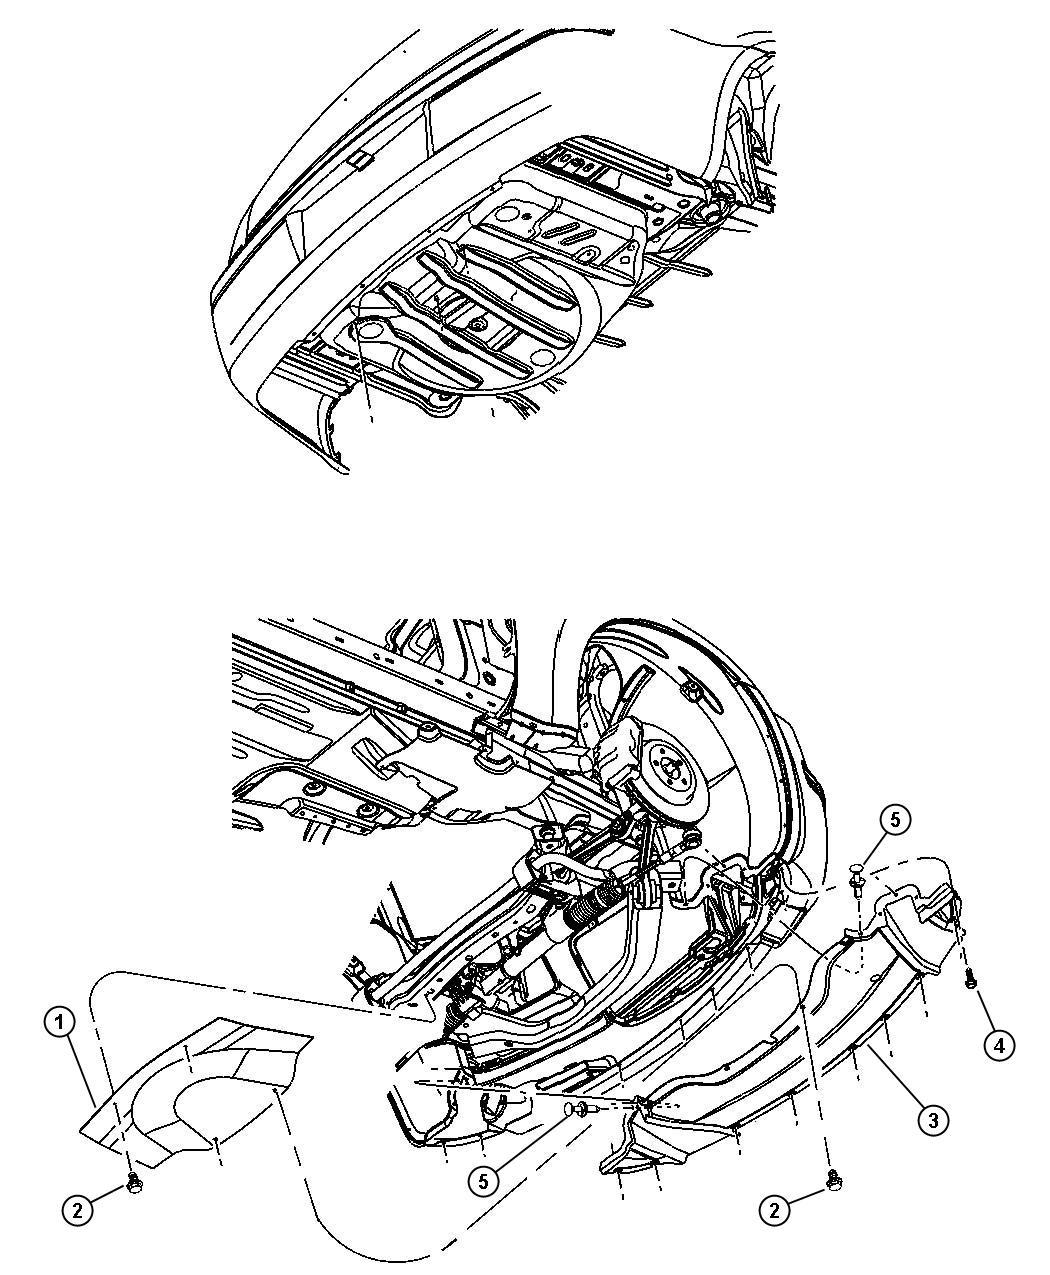 Dodge Challenger Belly Pan Front Skidplates